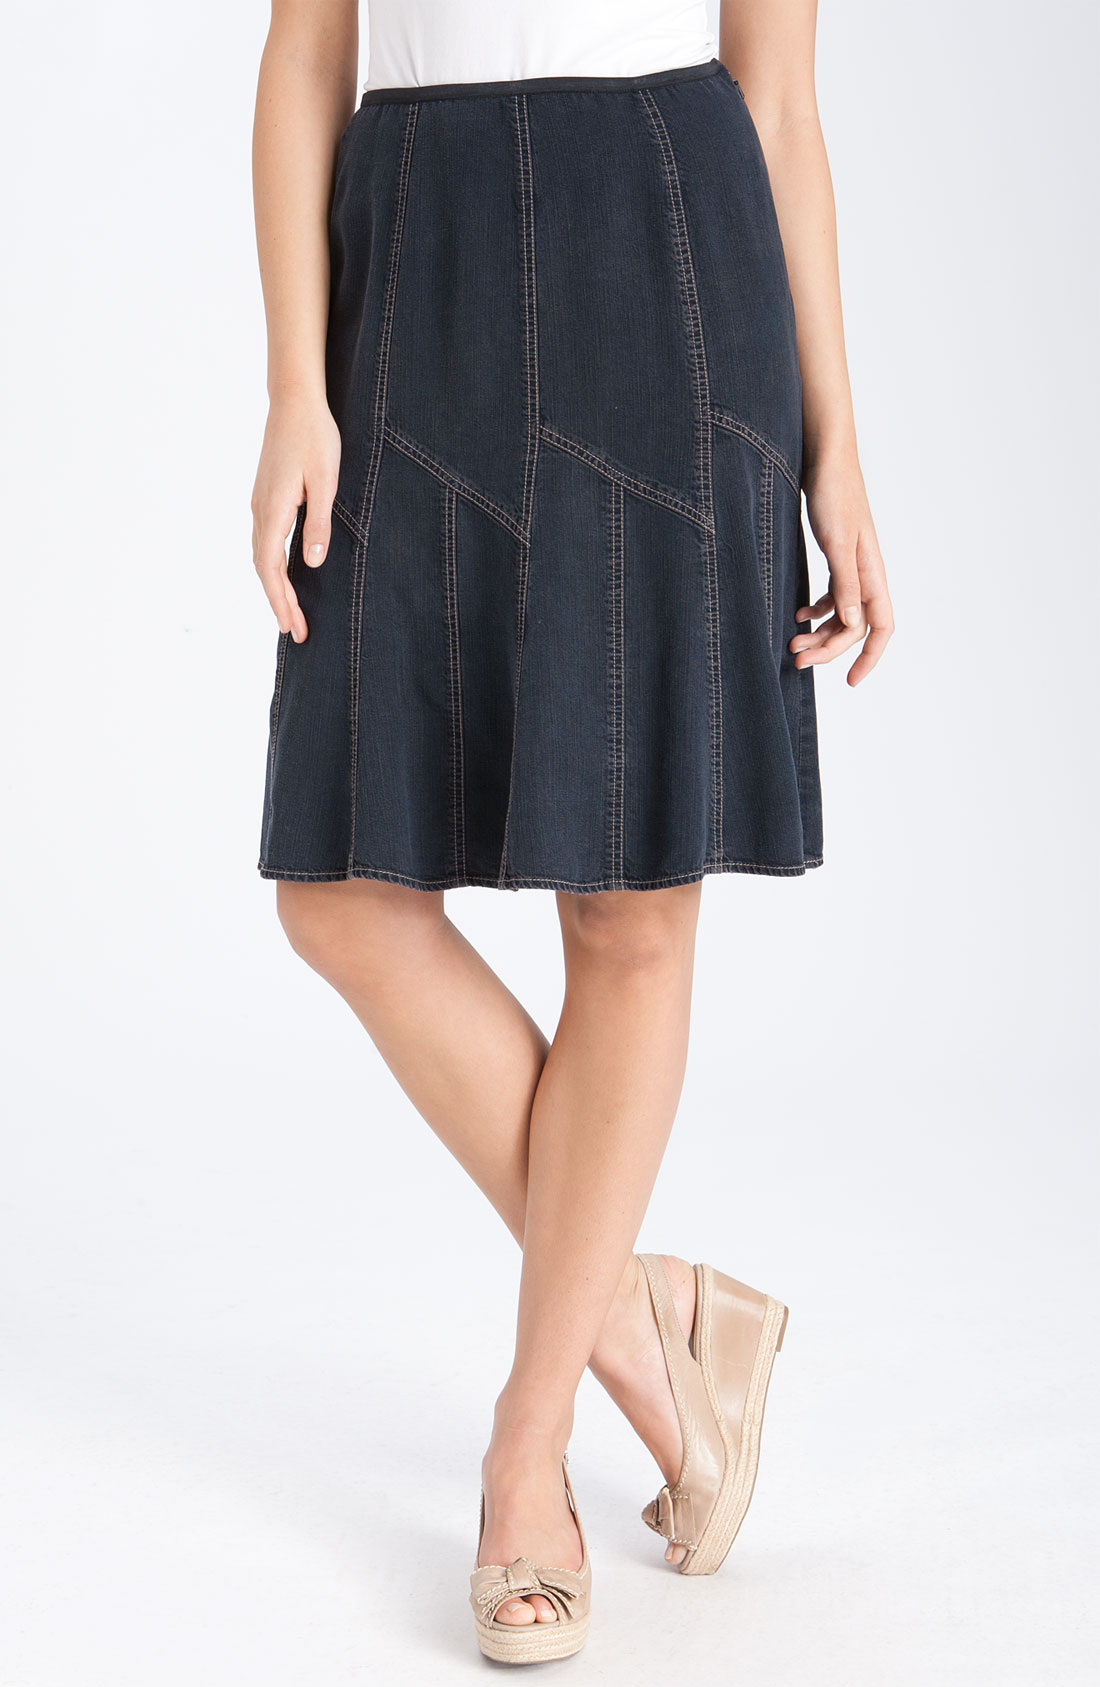 Nic + Zoe Denim Flirt Skirt in Blue (deep indigo)